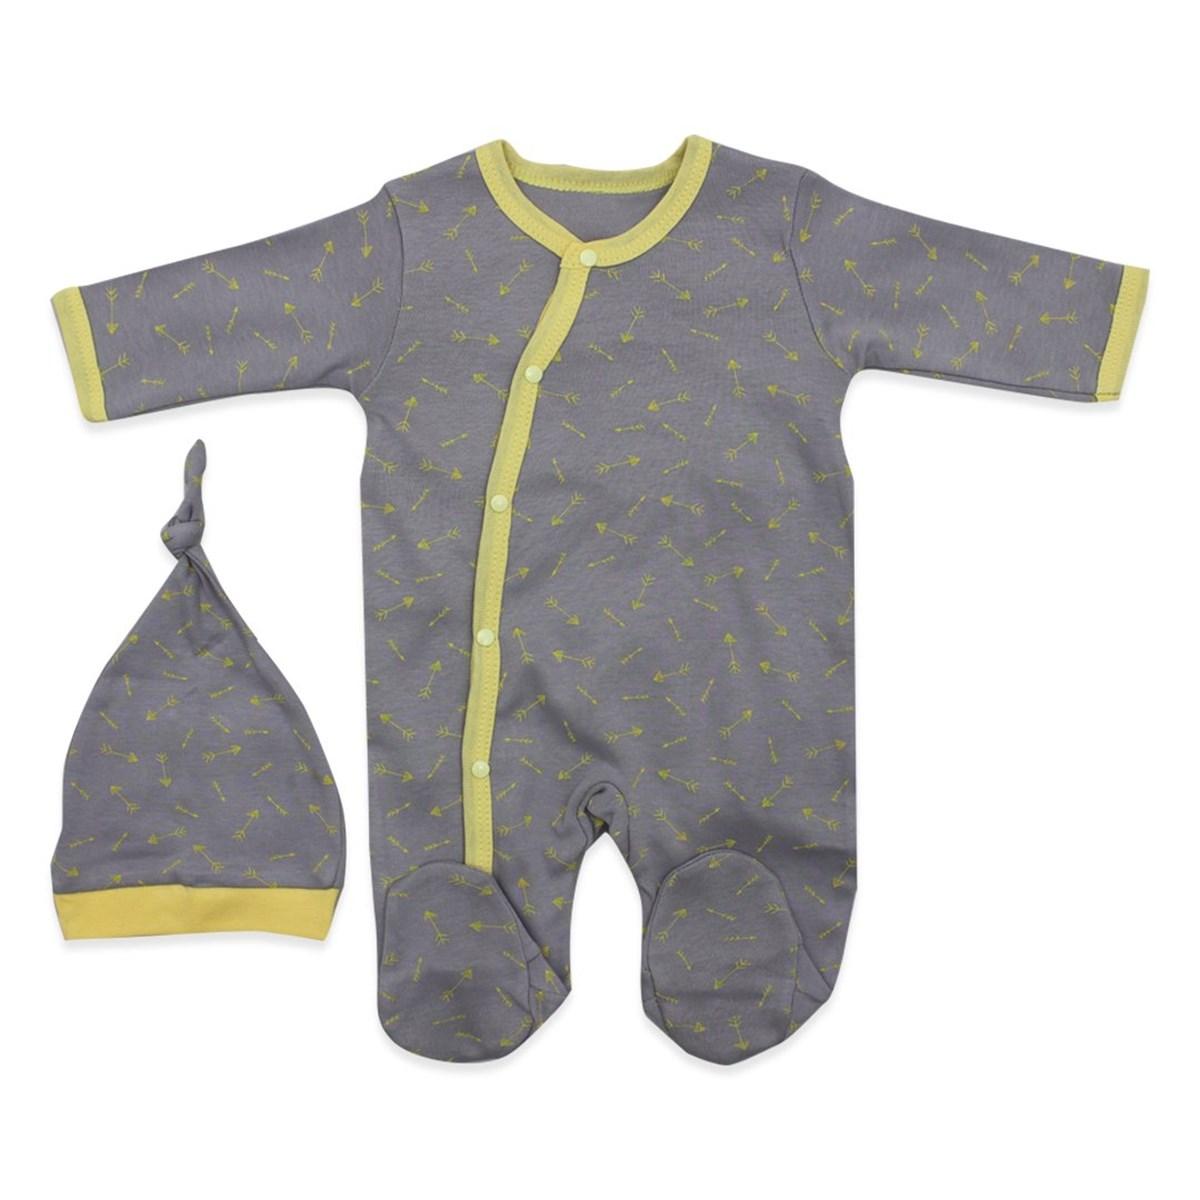 Baby's Printed Grey Romper